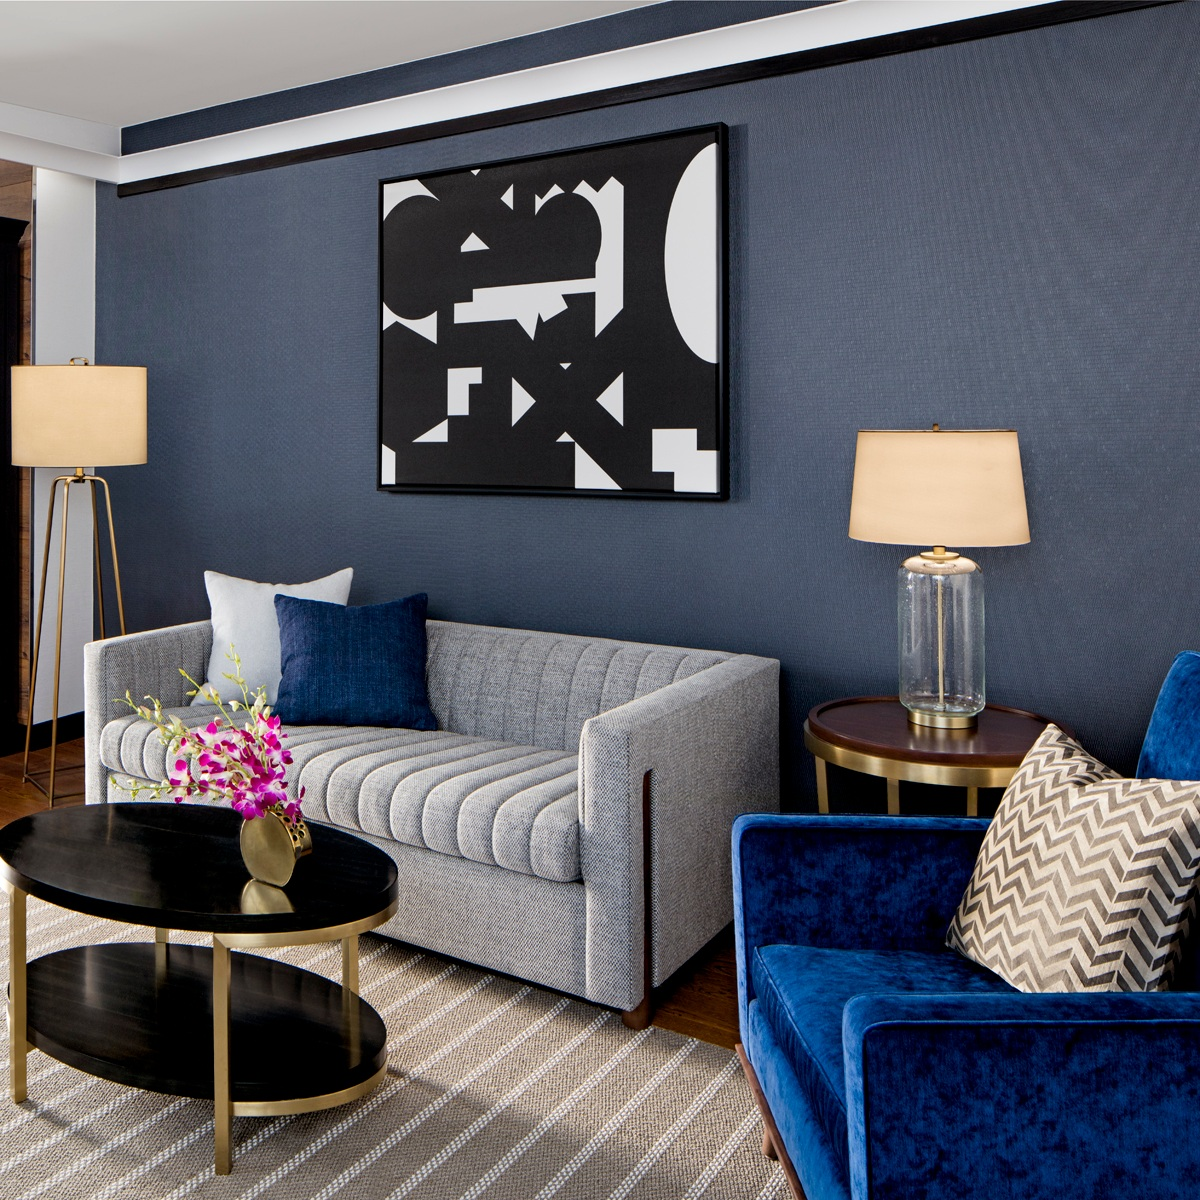 THE ST GREGORY HOTEL  / Washington, D.C.